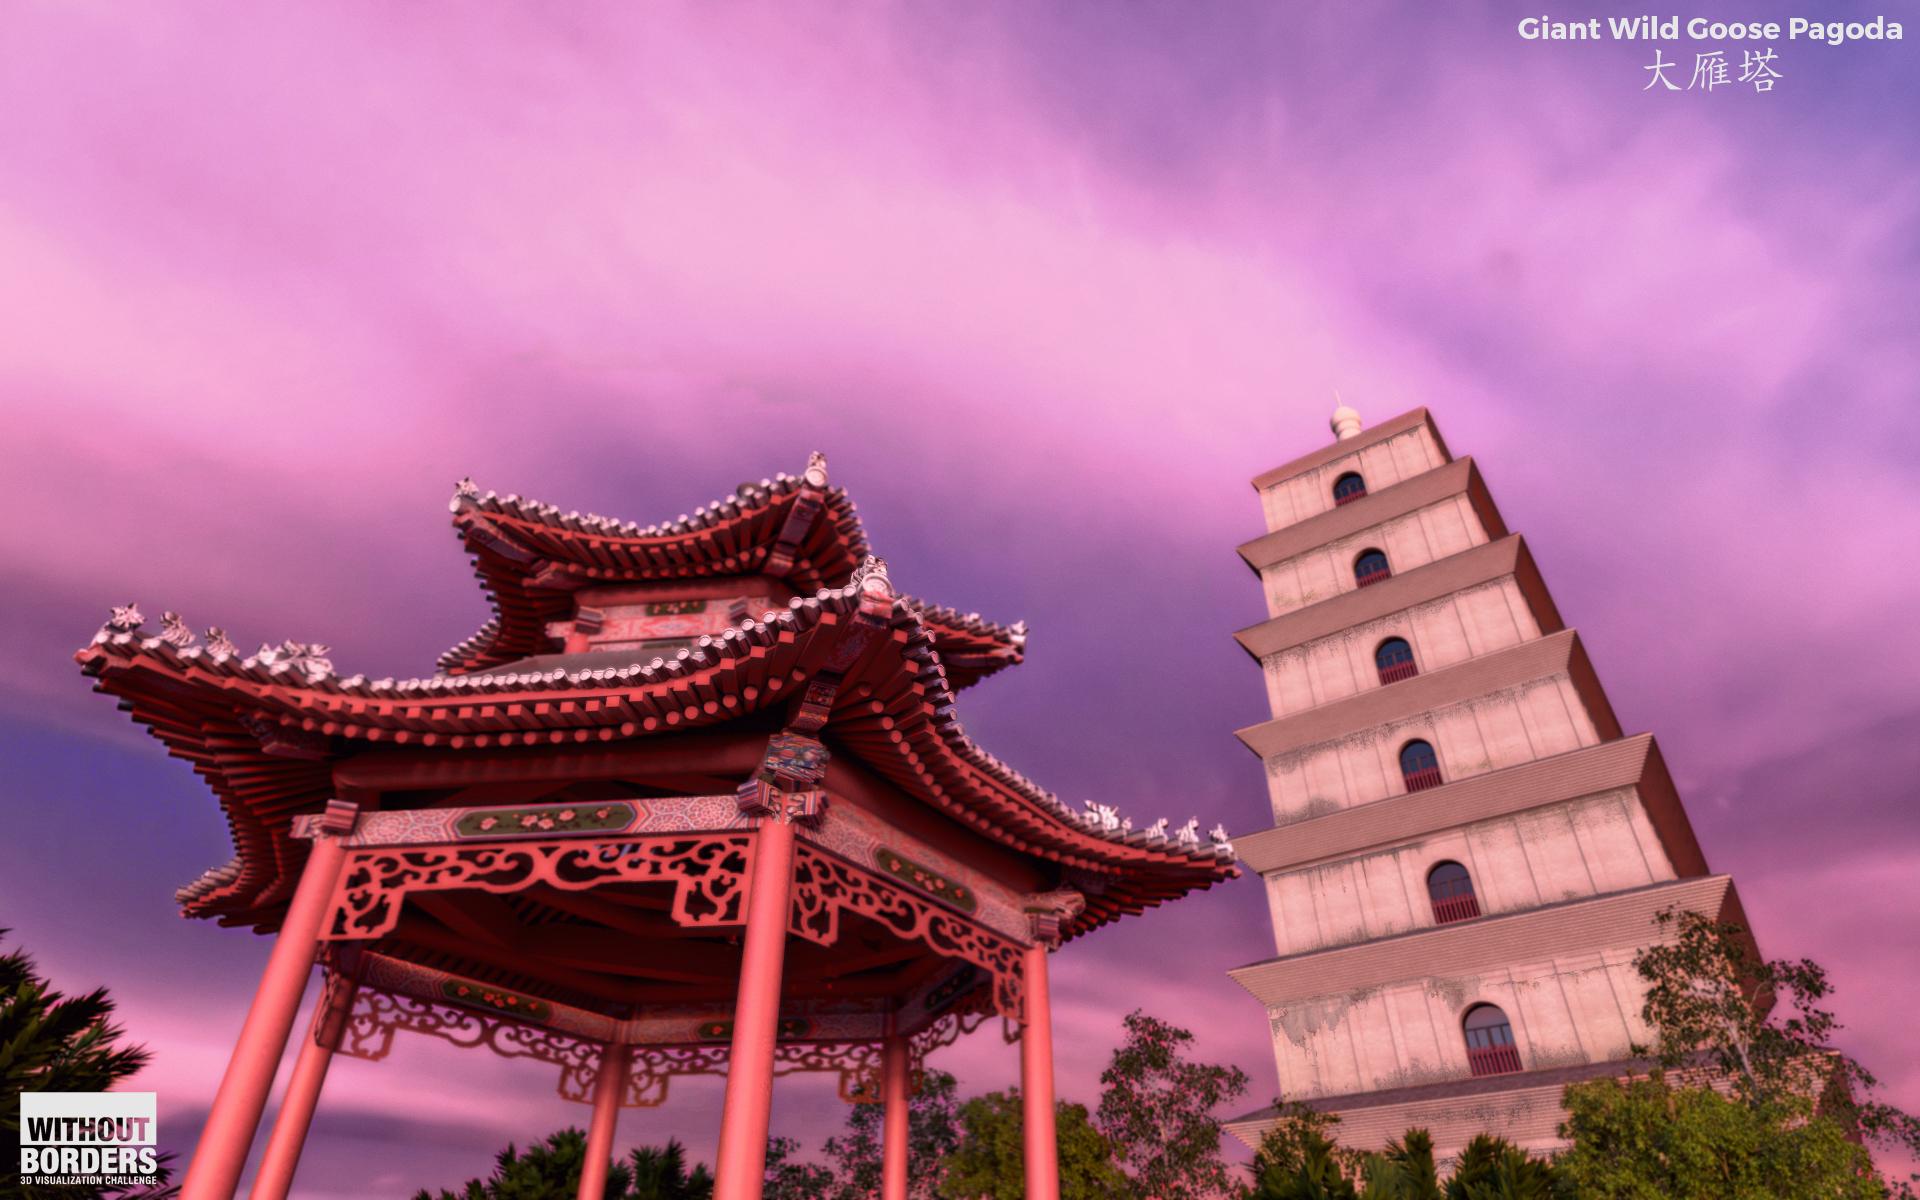 Without Borders - Giant Wild Goose Pagoda